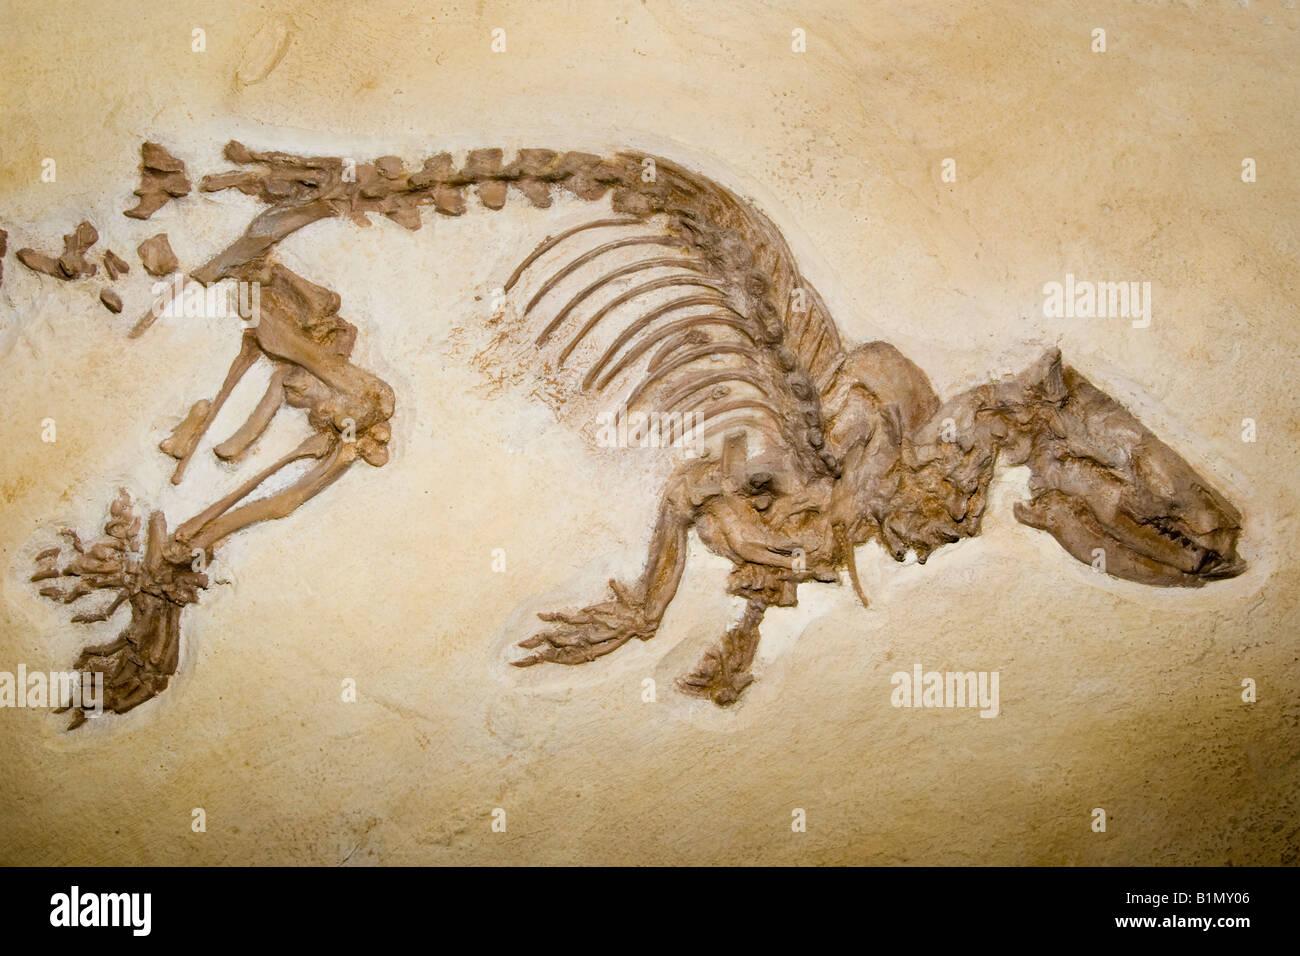 Fossil otter like animal, Palaeosinopa sp., Lower Eocene, Wyoming 50 million years old - Stock Image